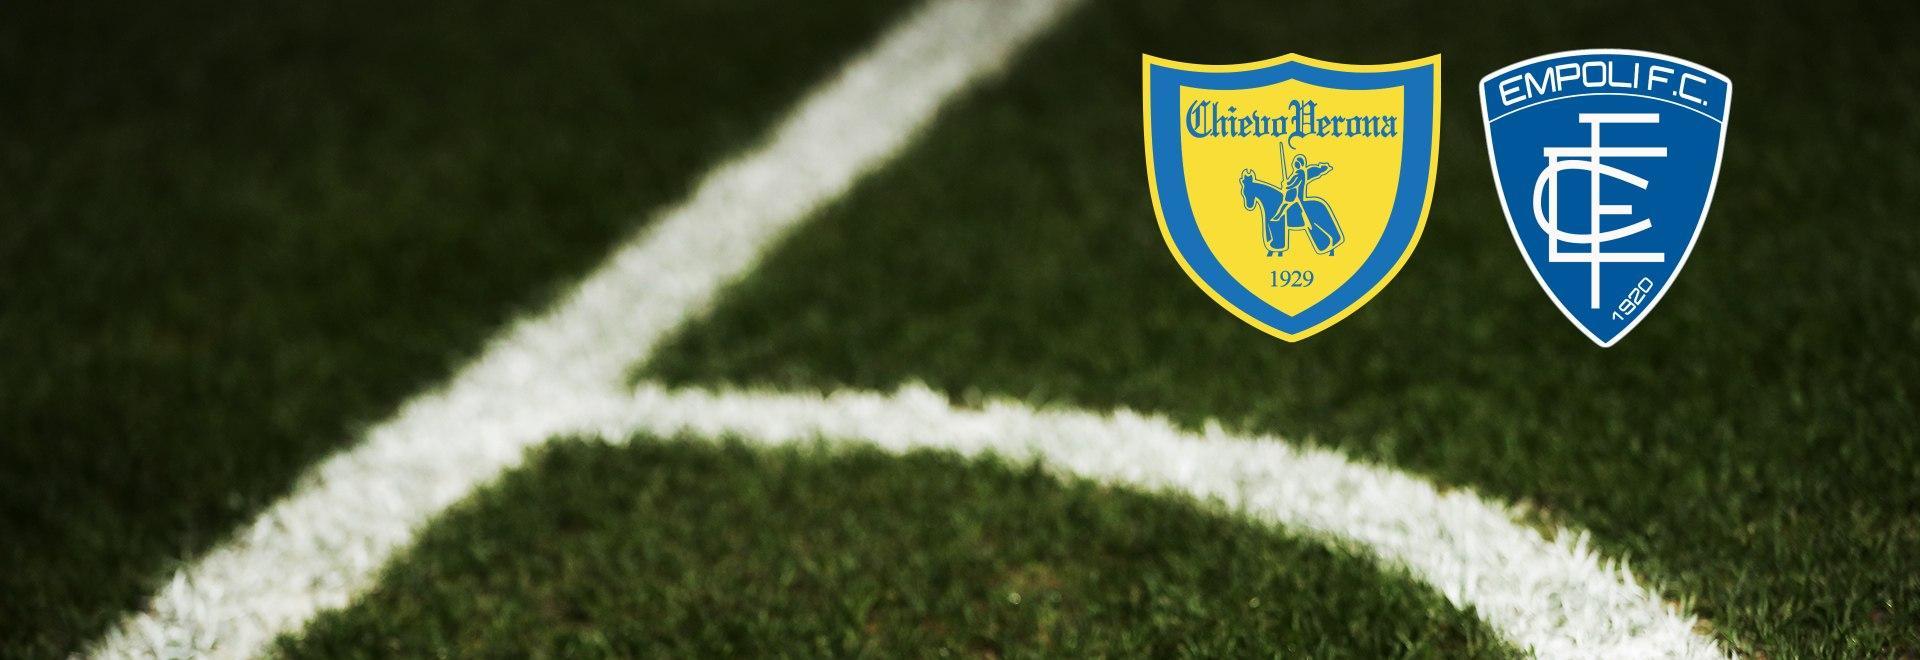 Chievo - Empoli. Playoff